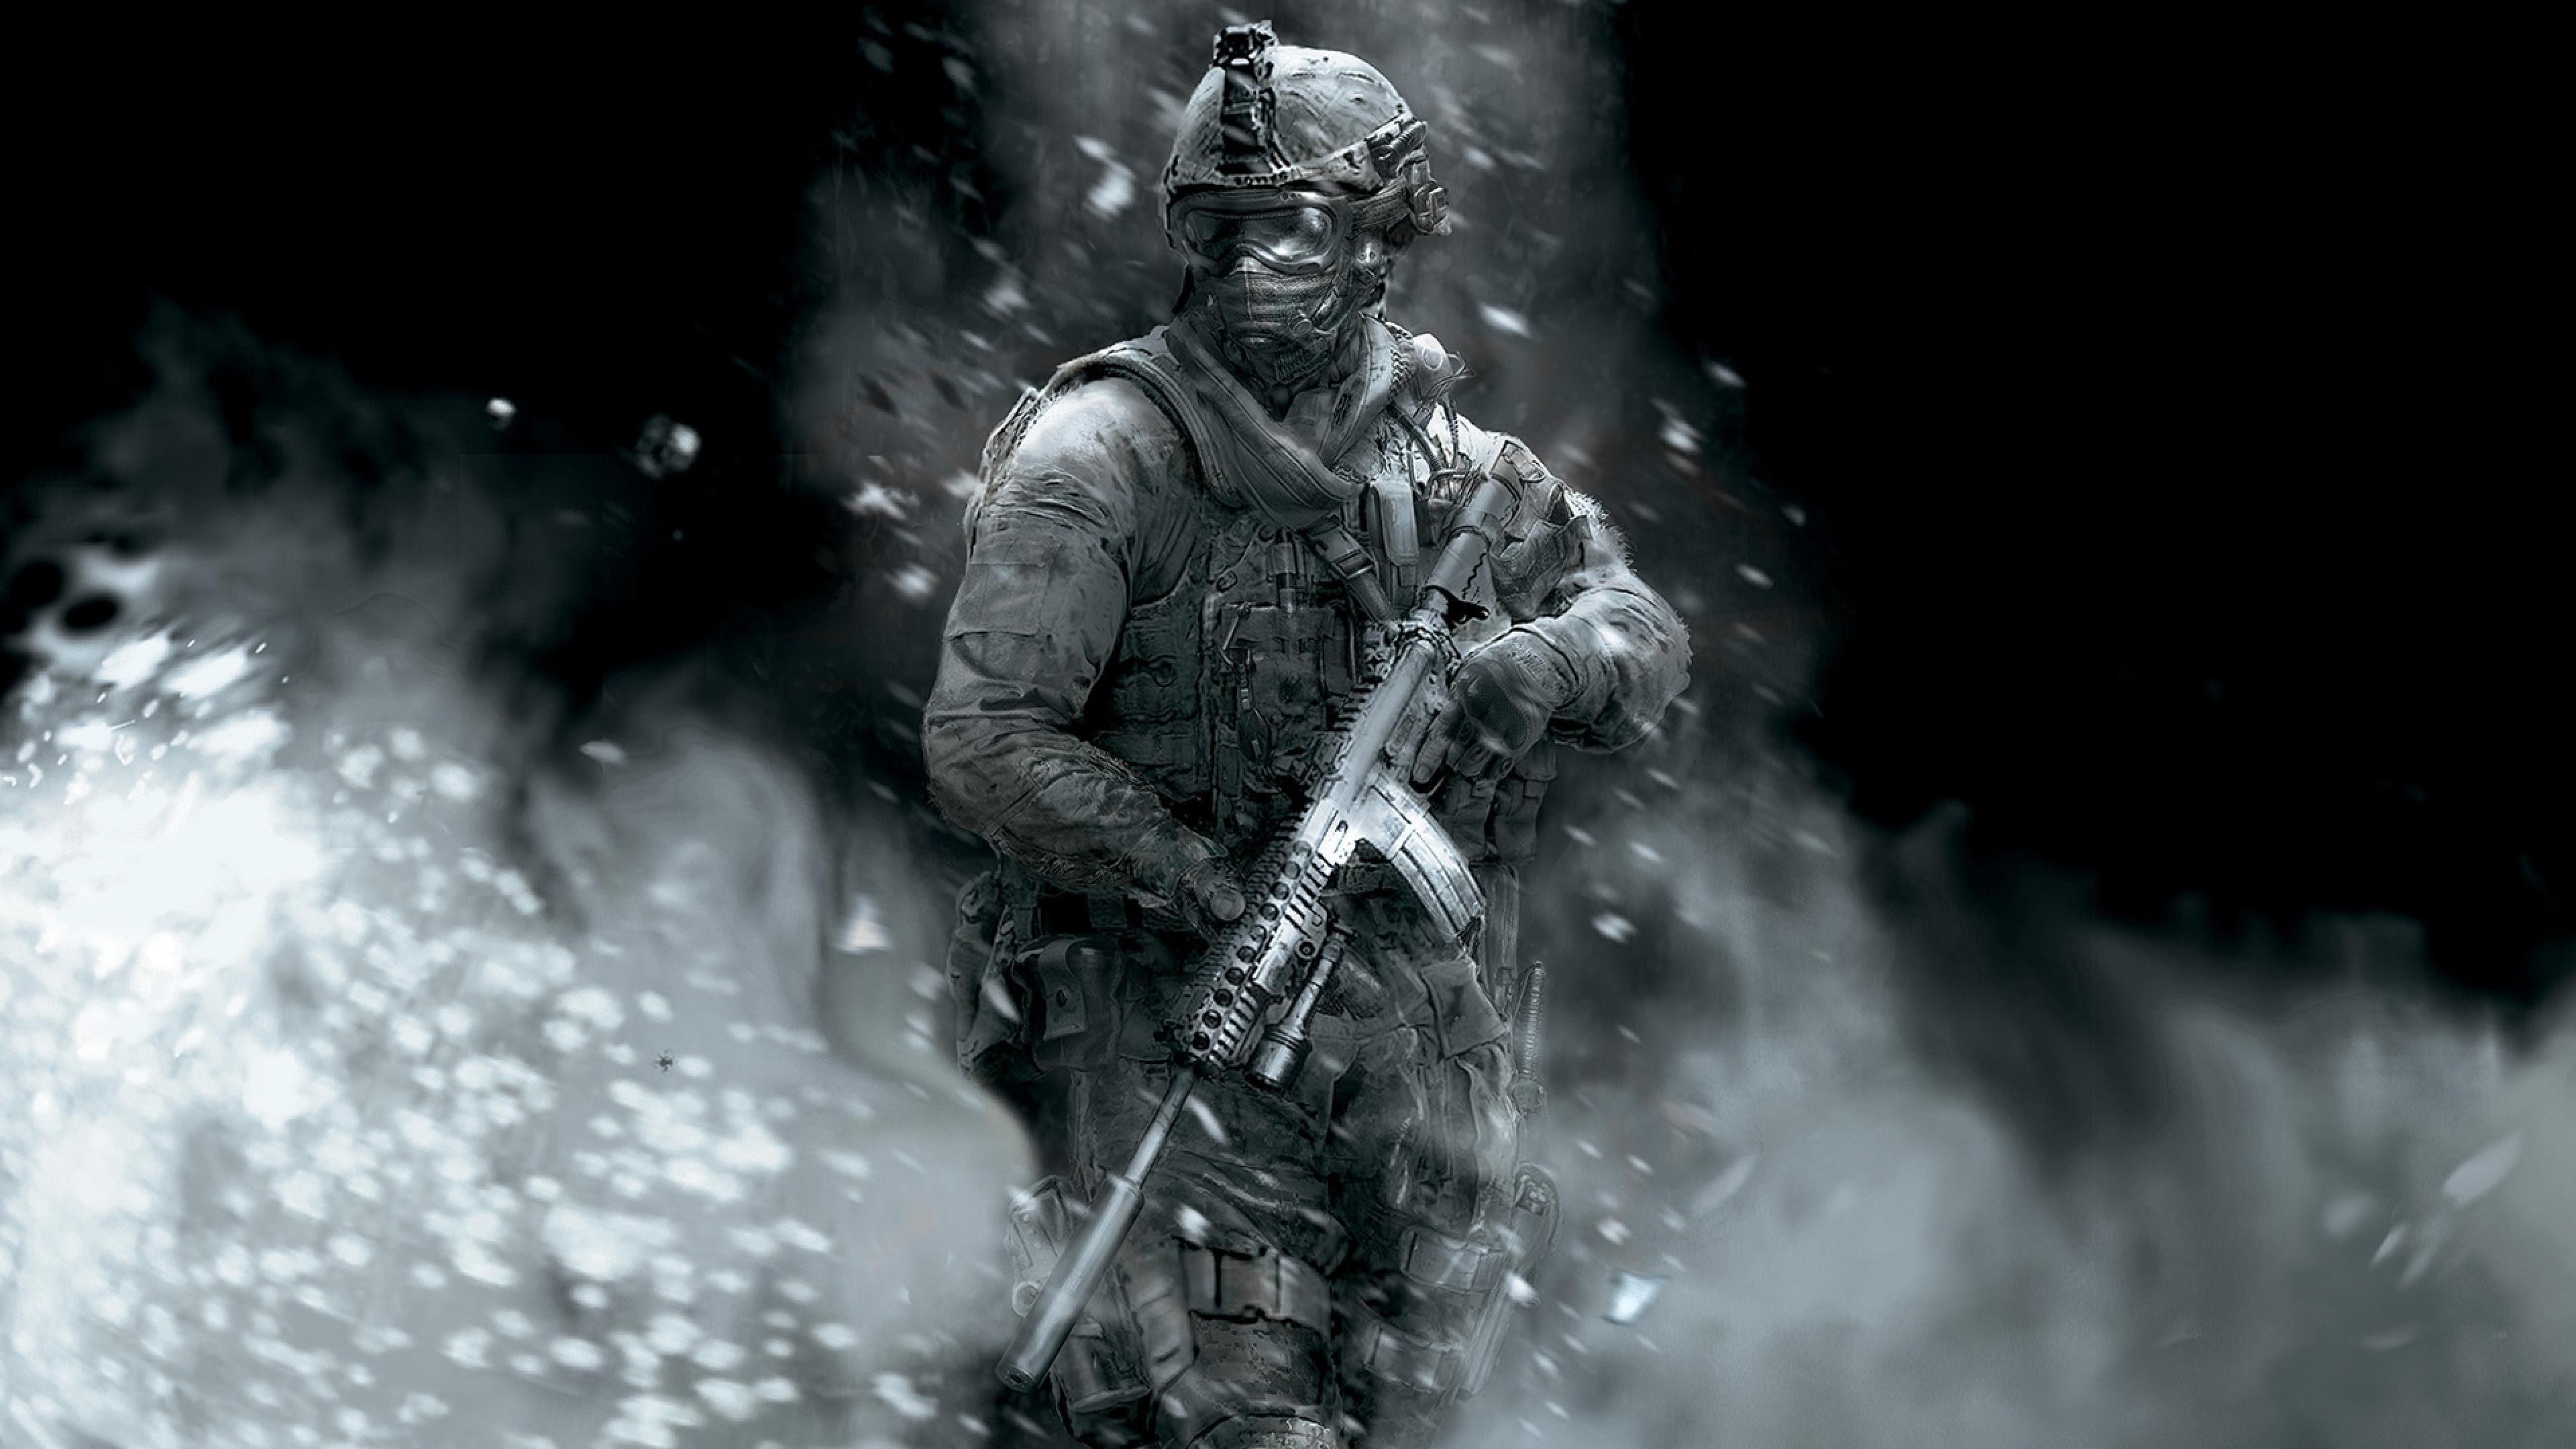 Call Of Duty Hd Wallpaper Sf Wallpaper